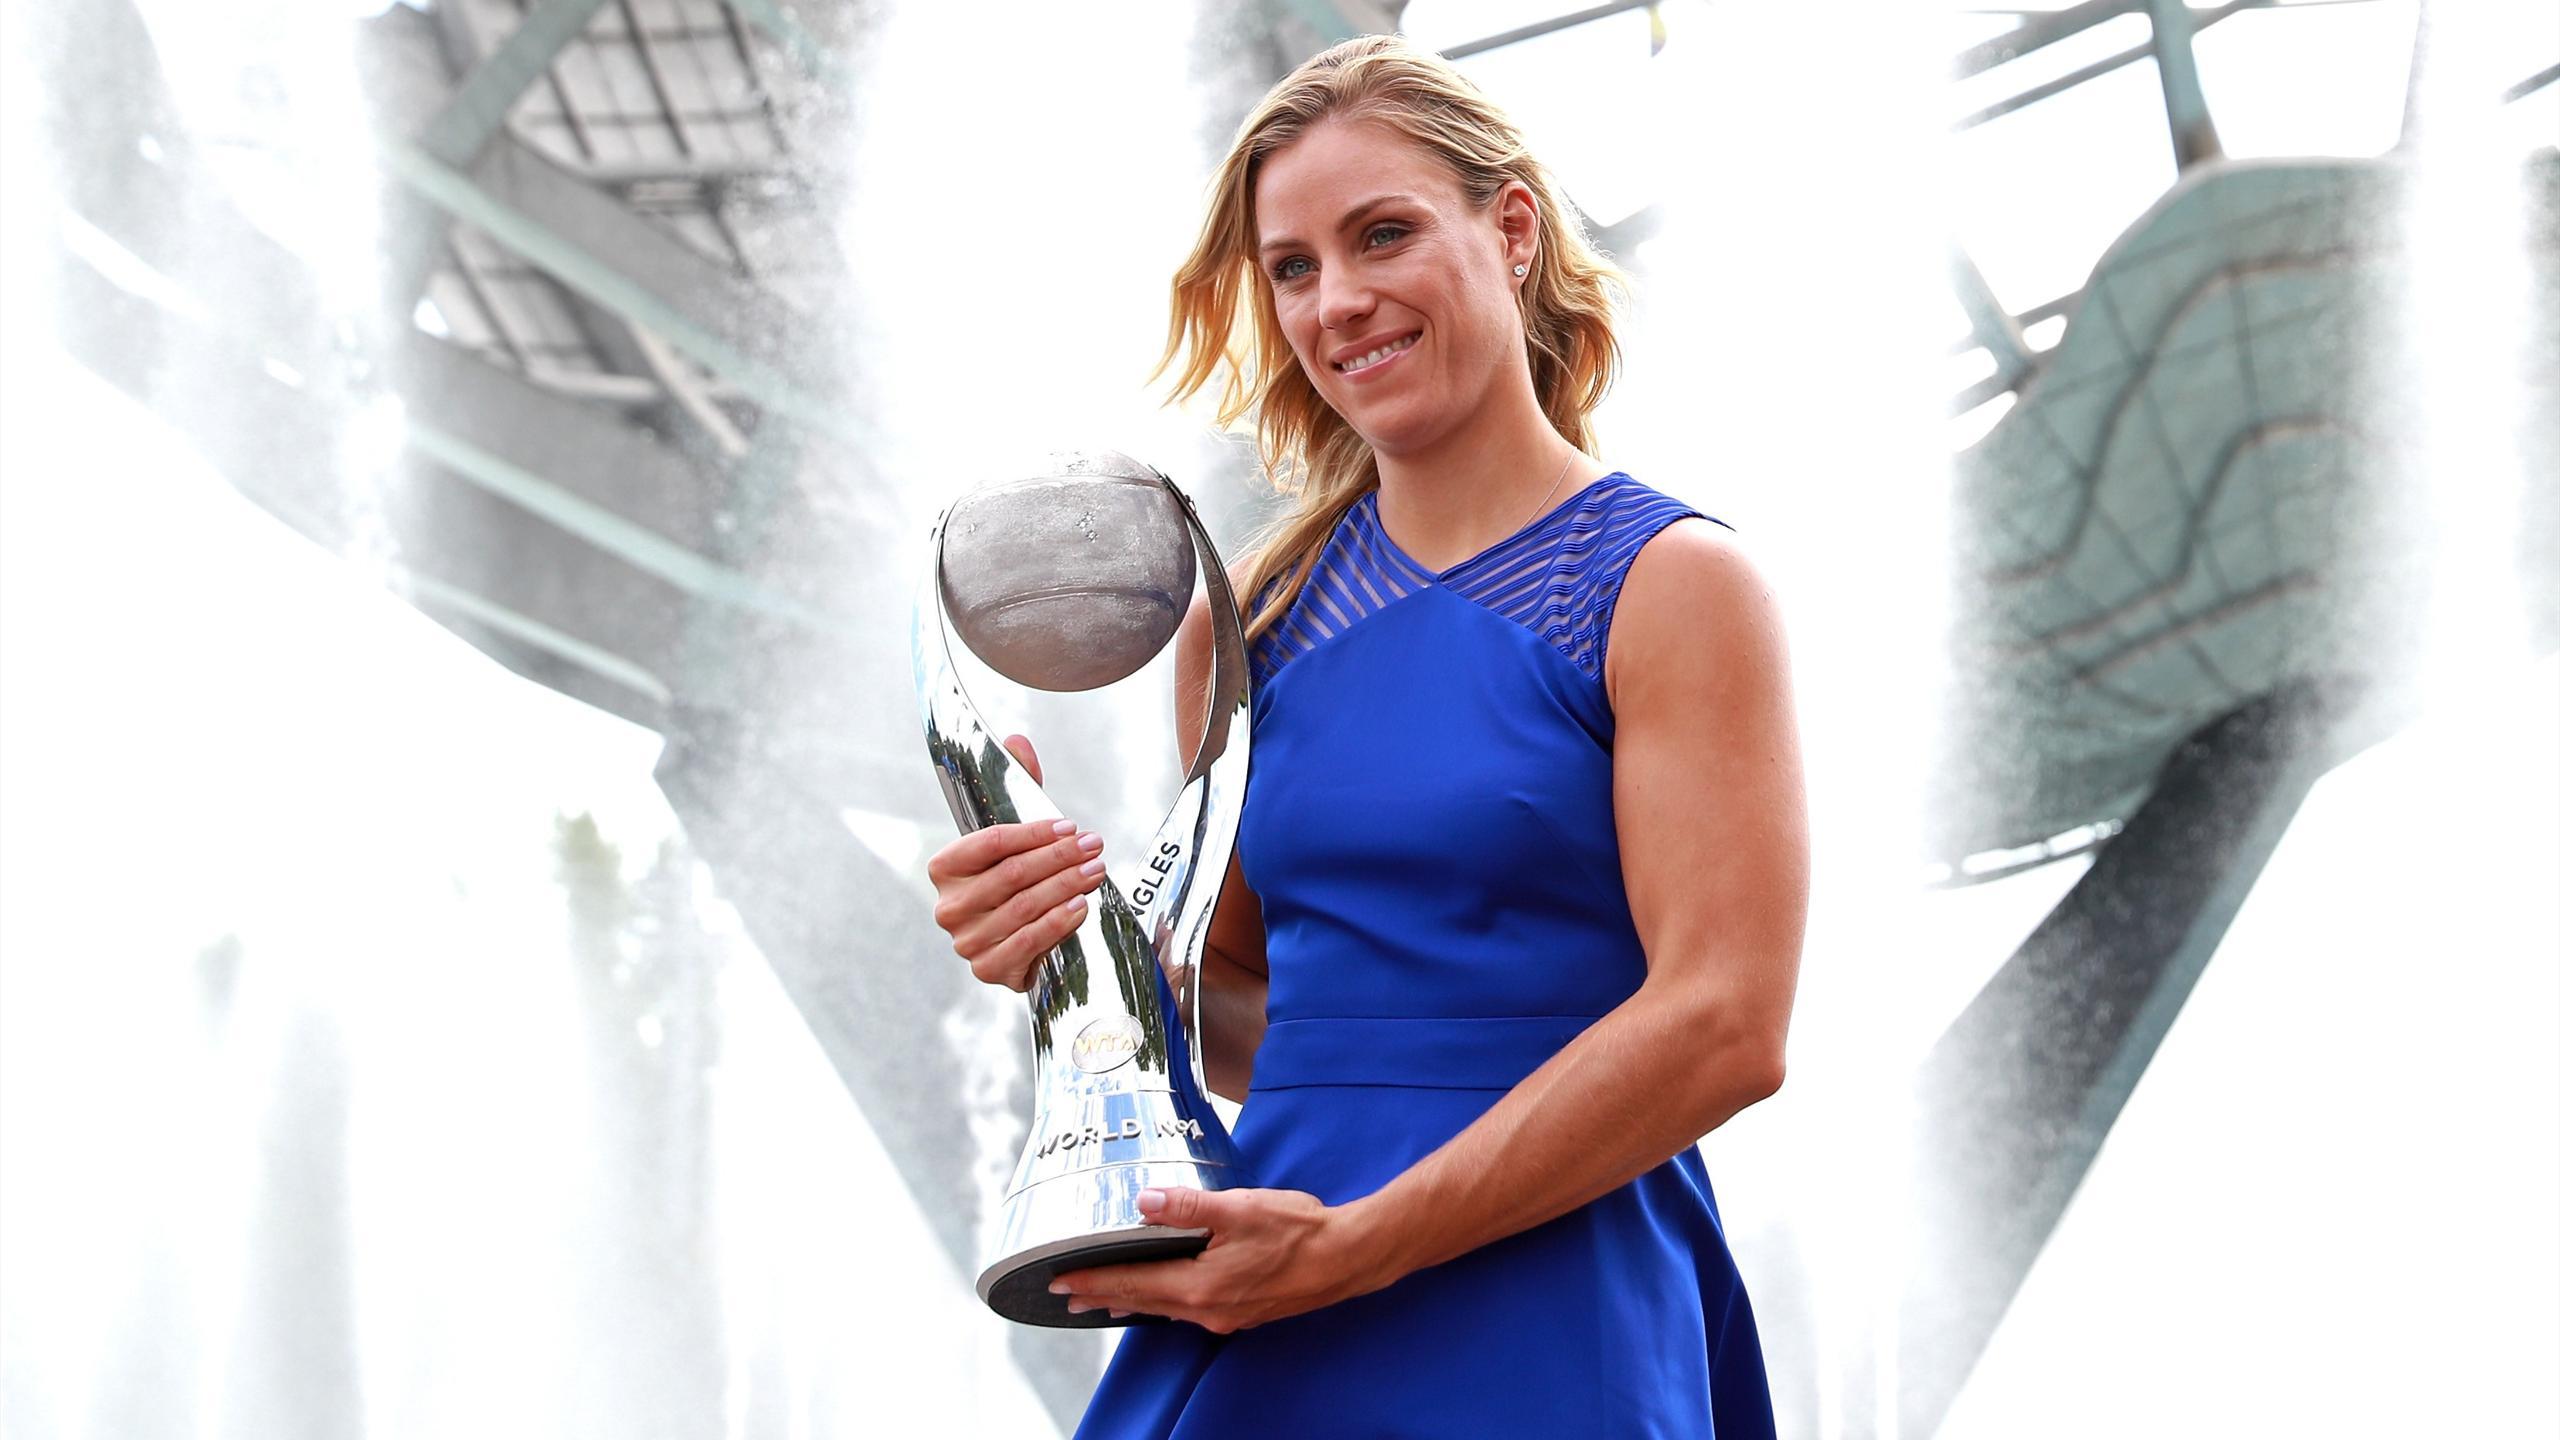 Ангелика Кербер – победительница US Open